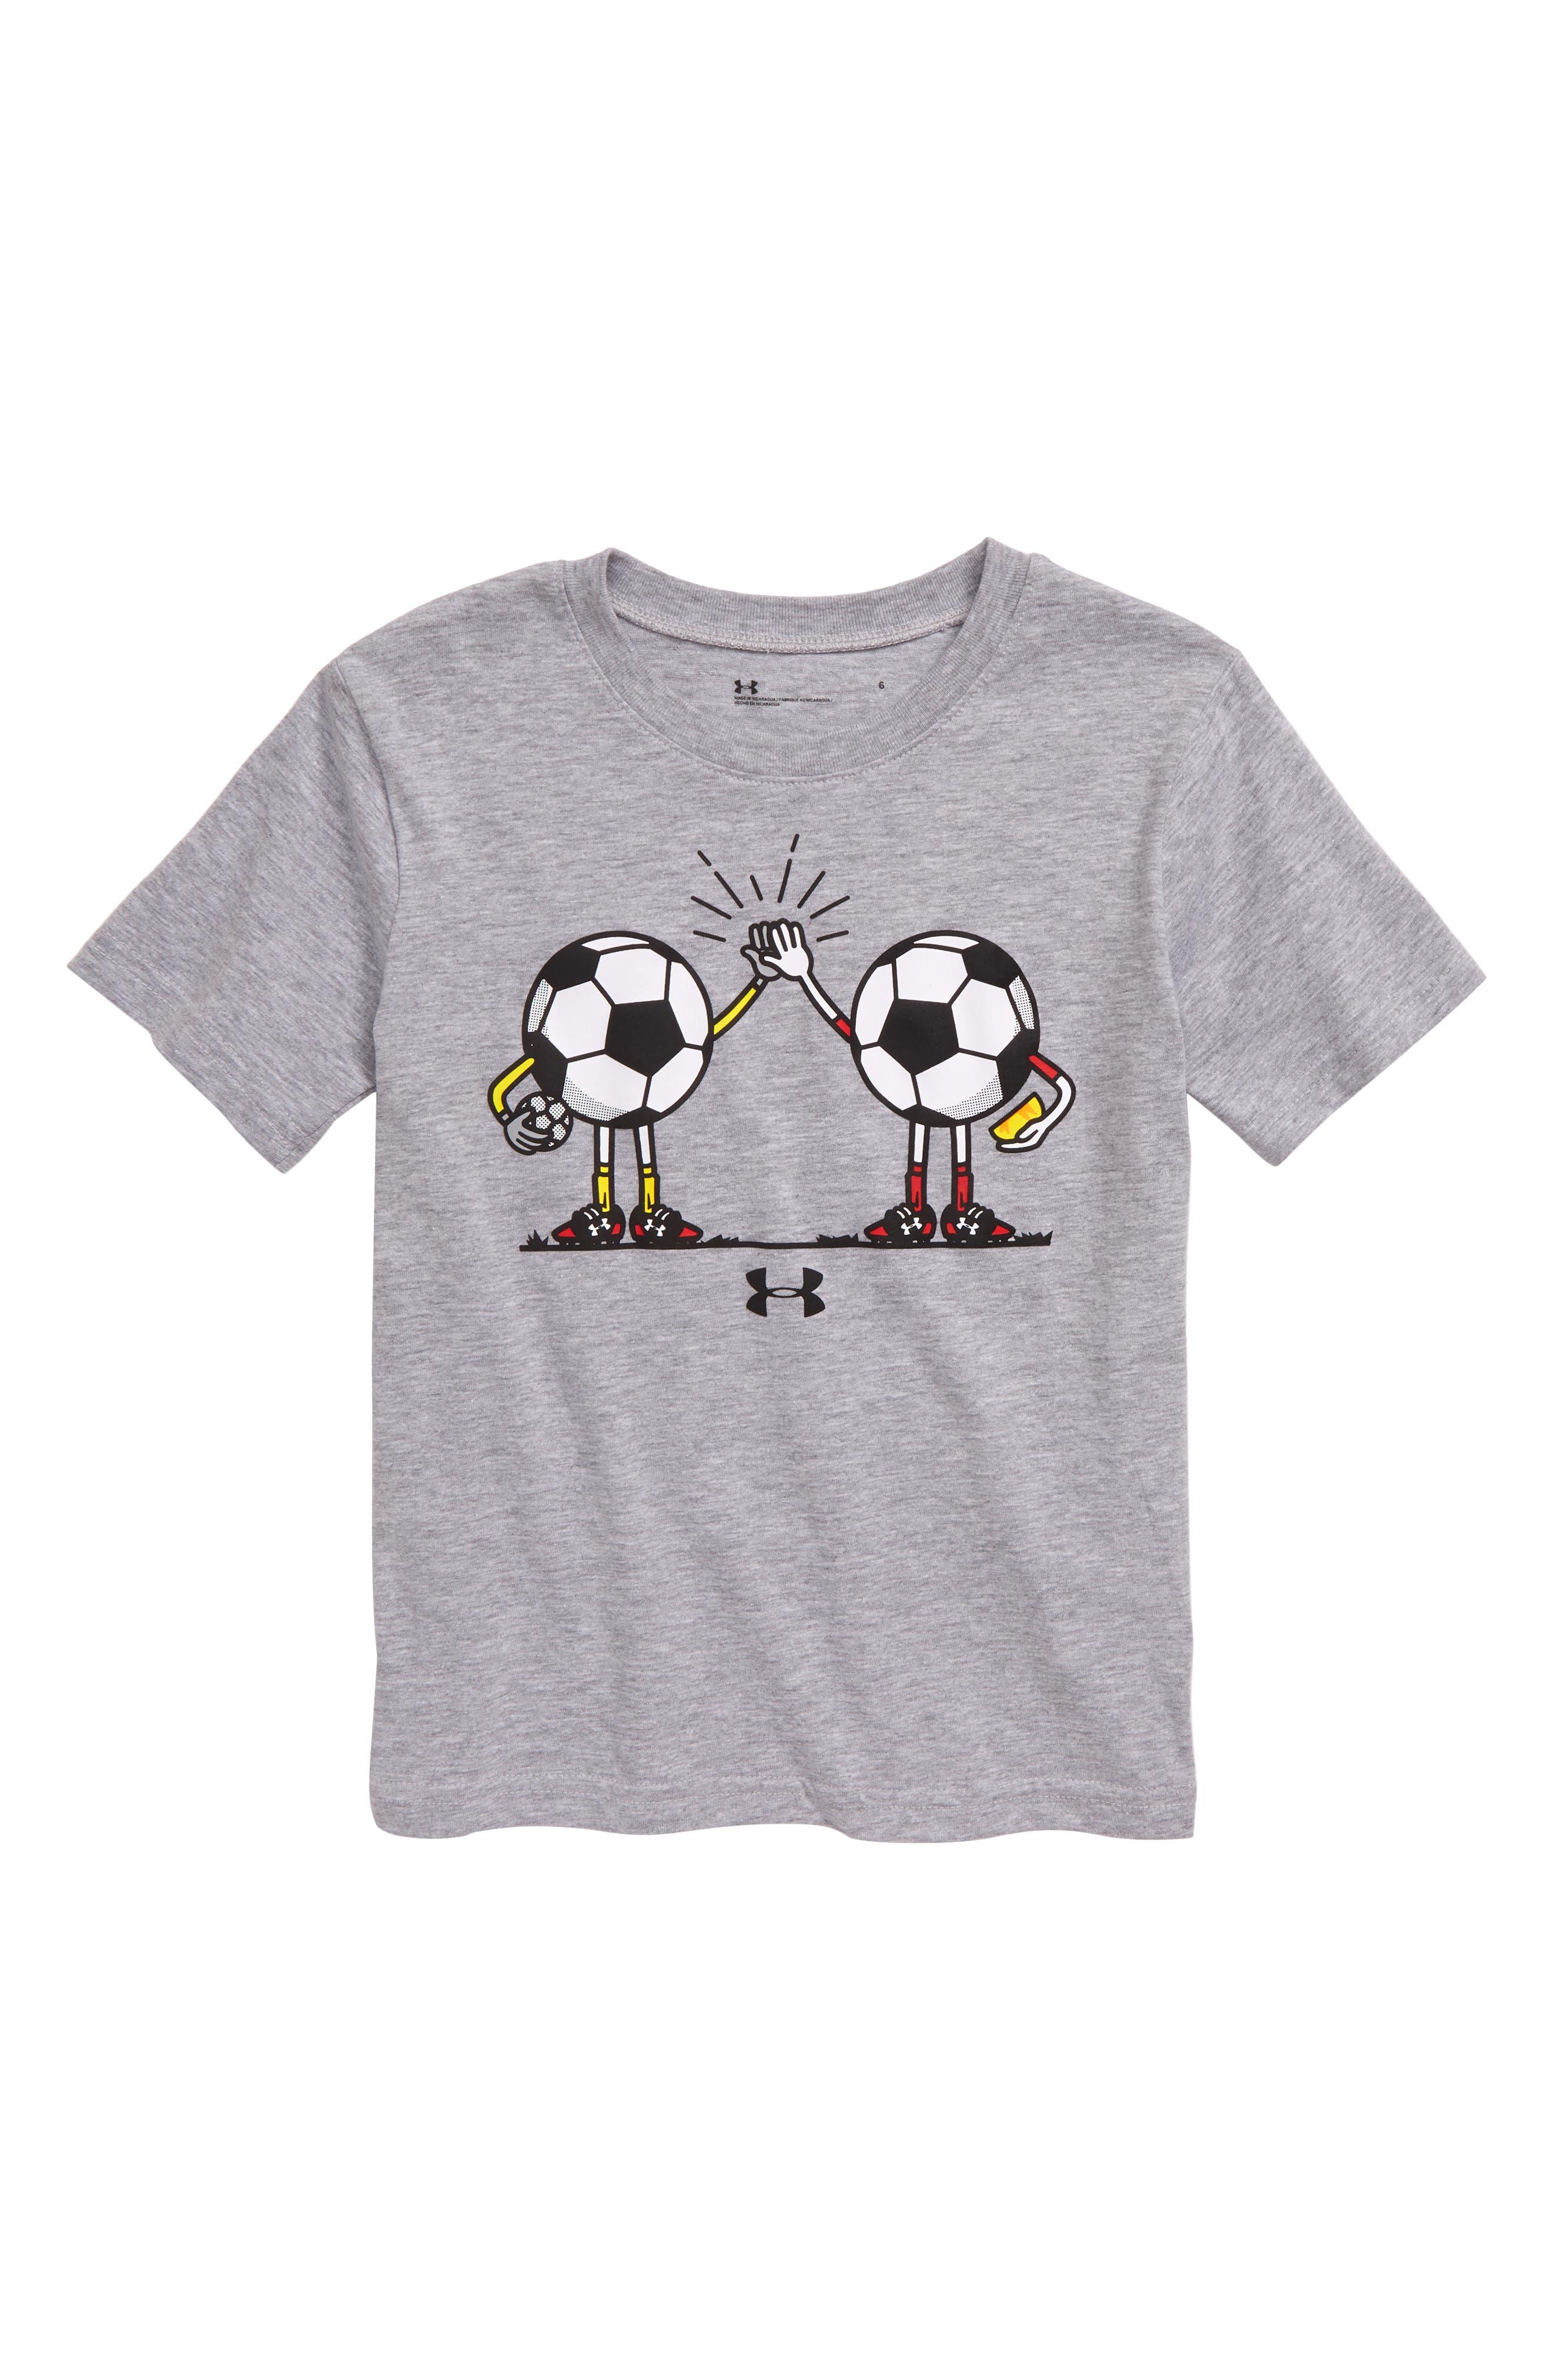 Toddler Boys Under Armour High Five Heatgear TShirt Size 2T  Grey